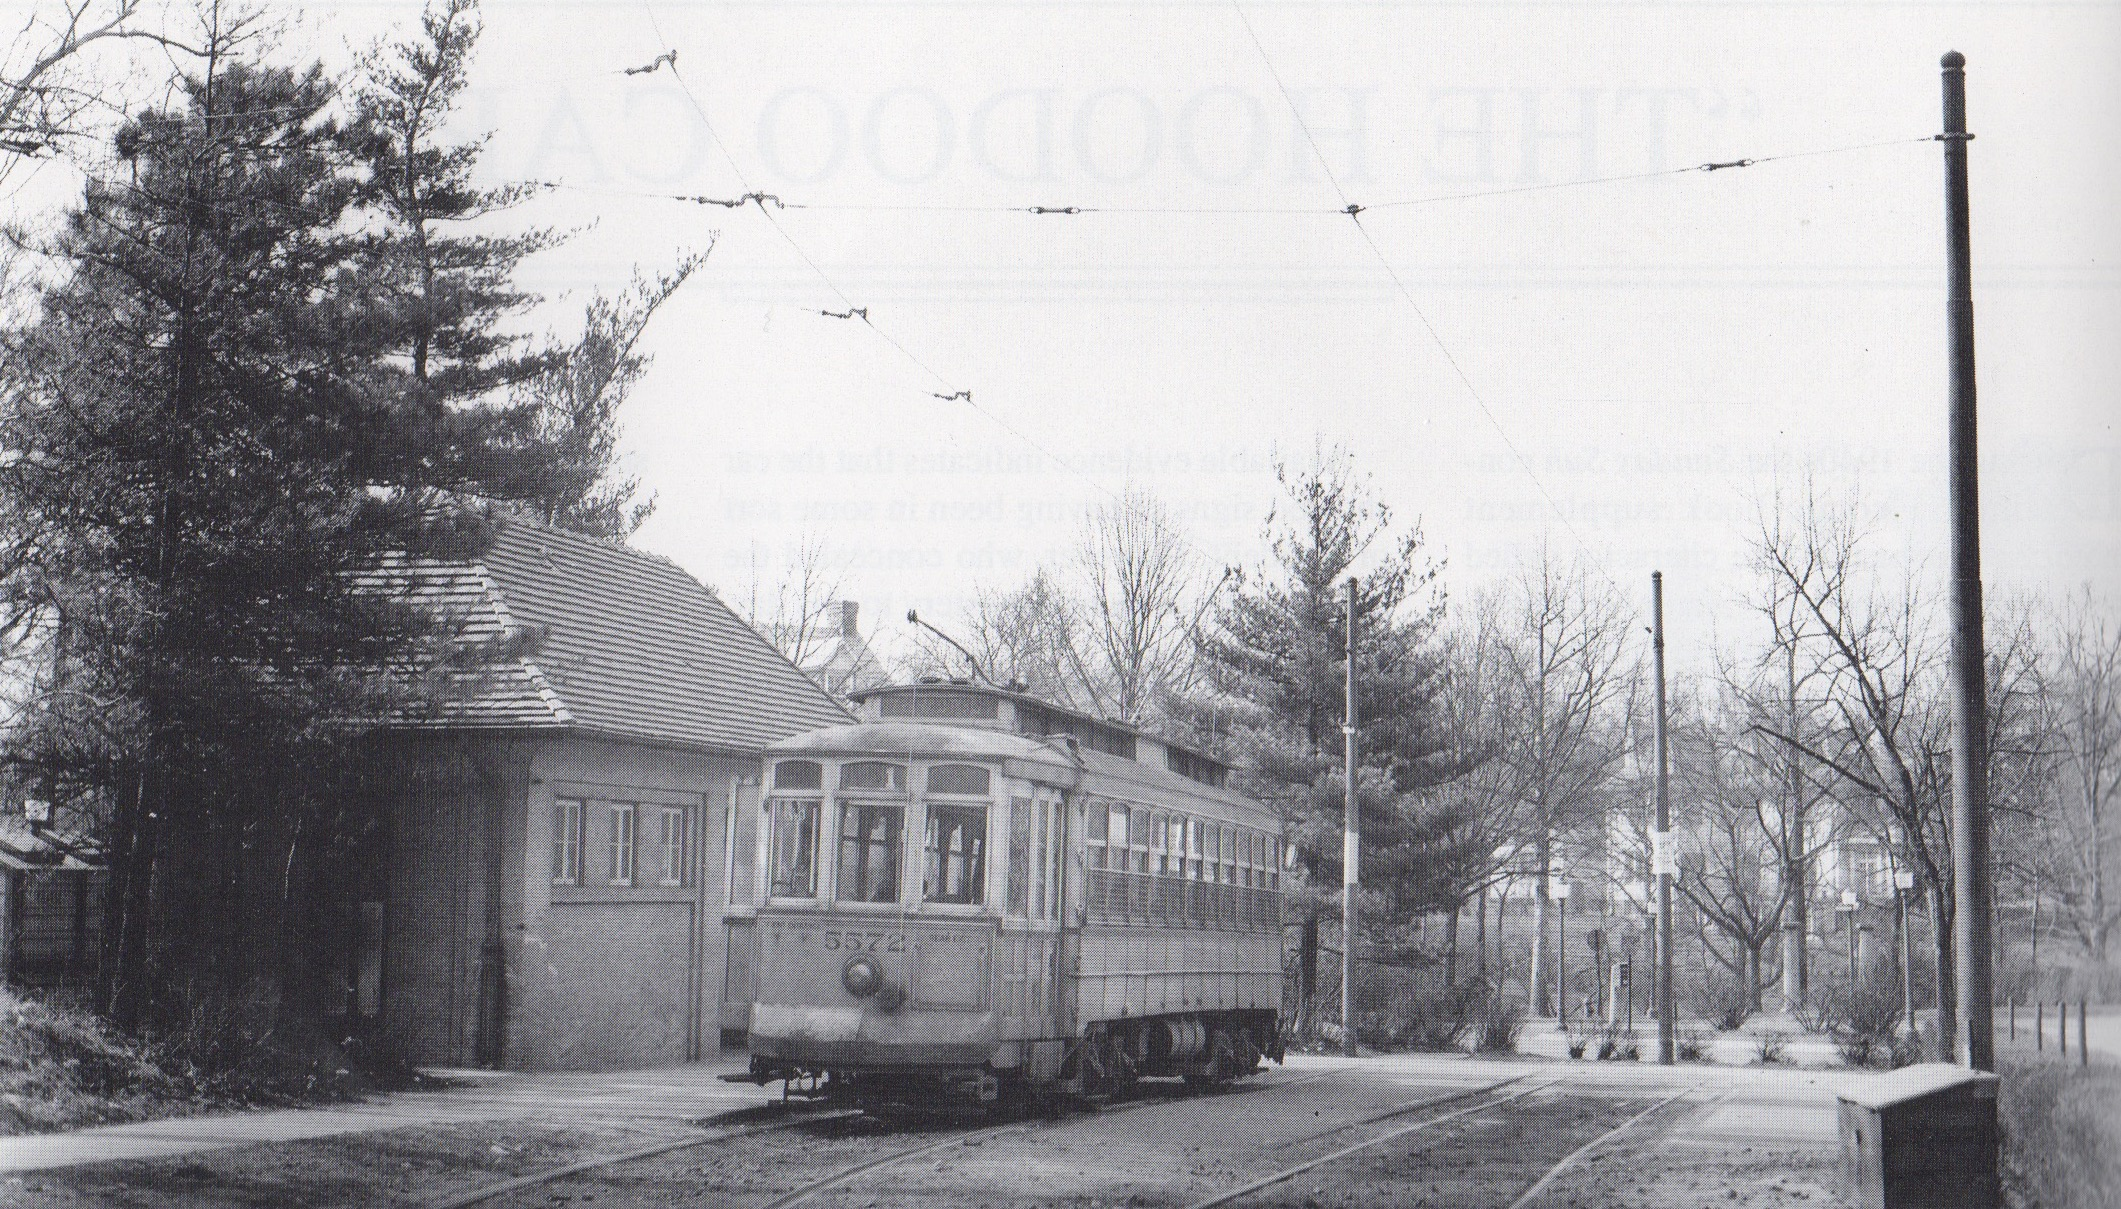 Image Credit: BSM Archives, Bedford Square, 1947